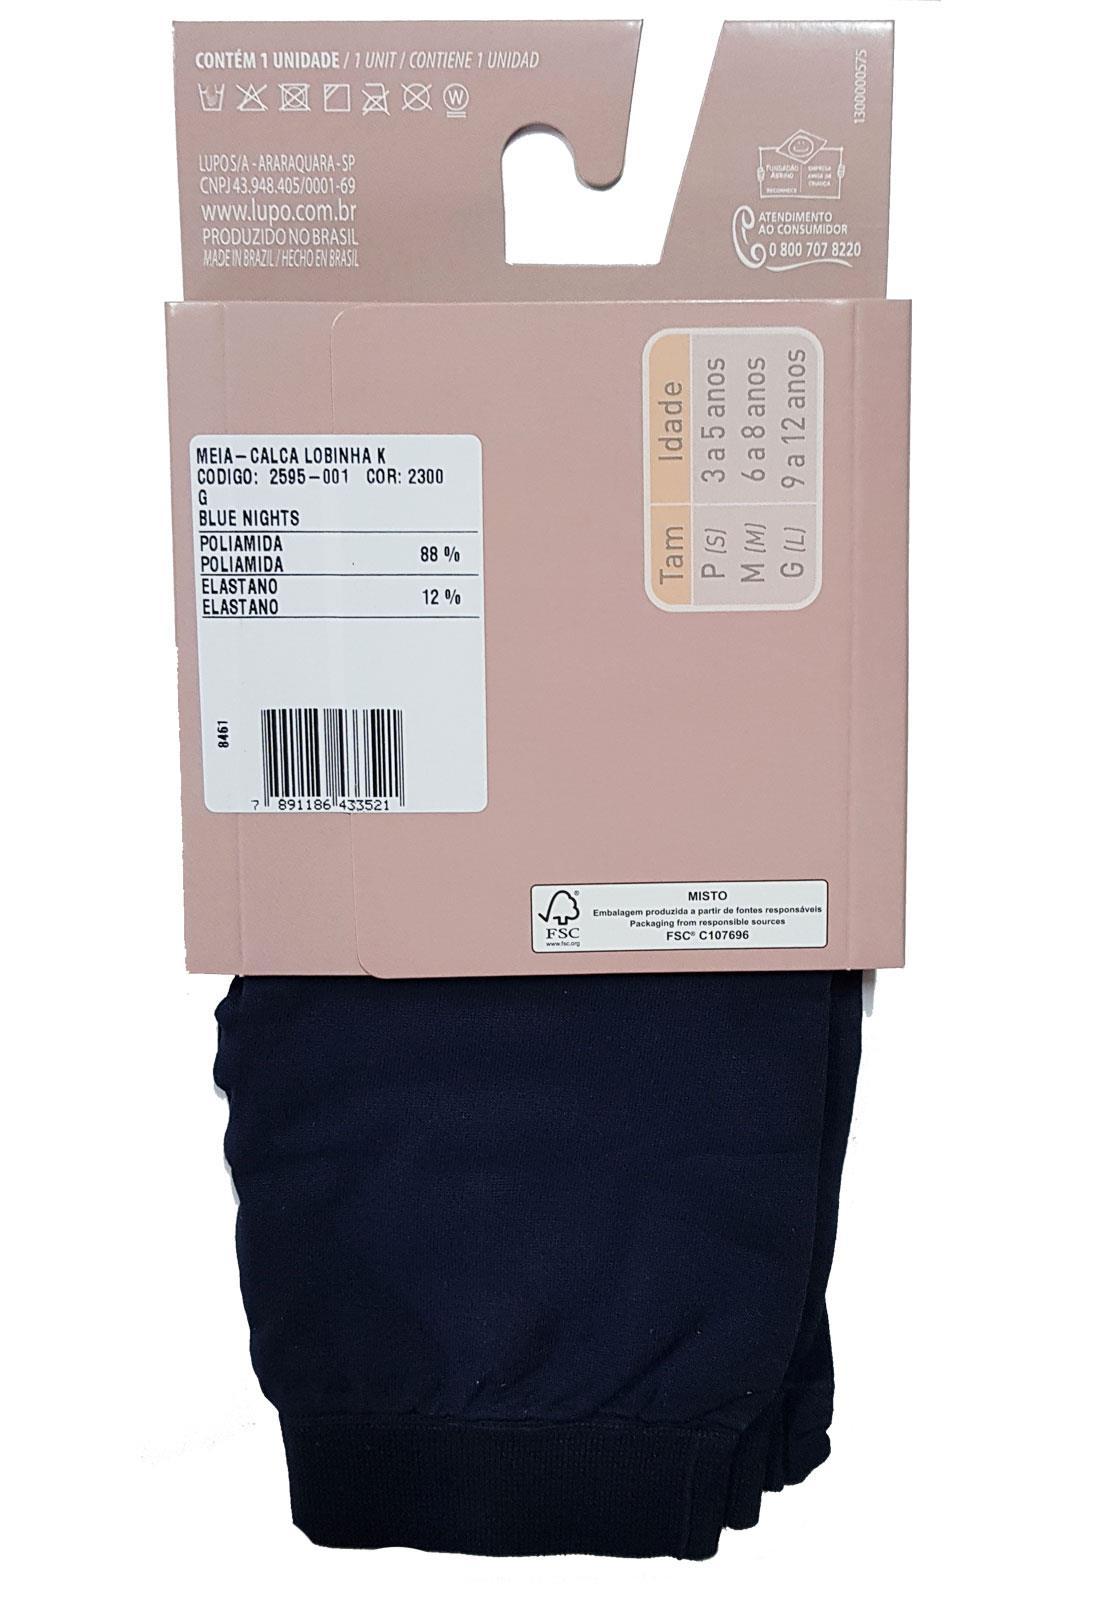 3b1358155 Meia Calça Legging Infantil Lupo Colors 2595-001